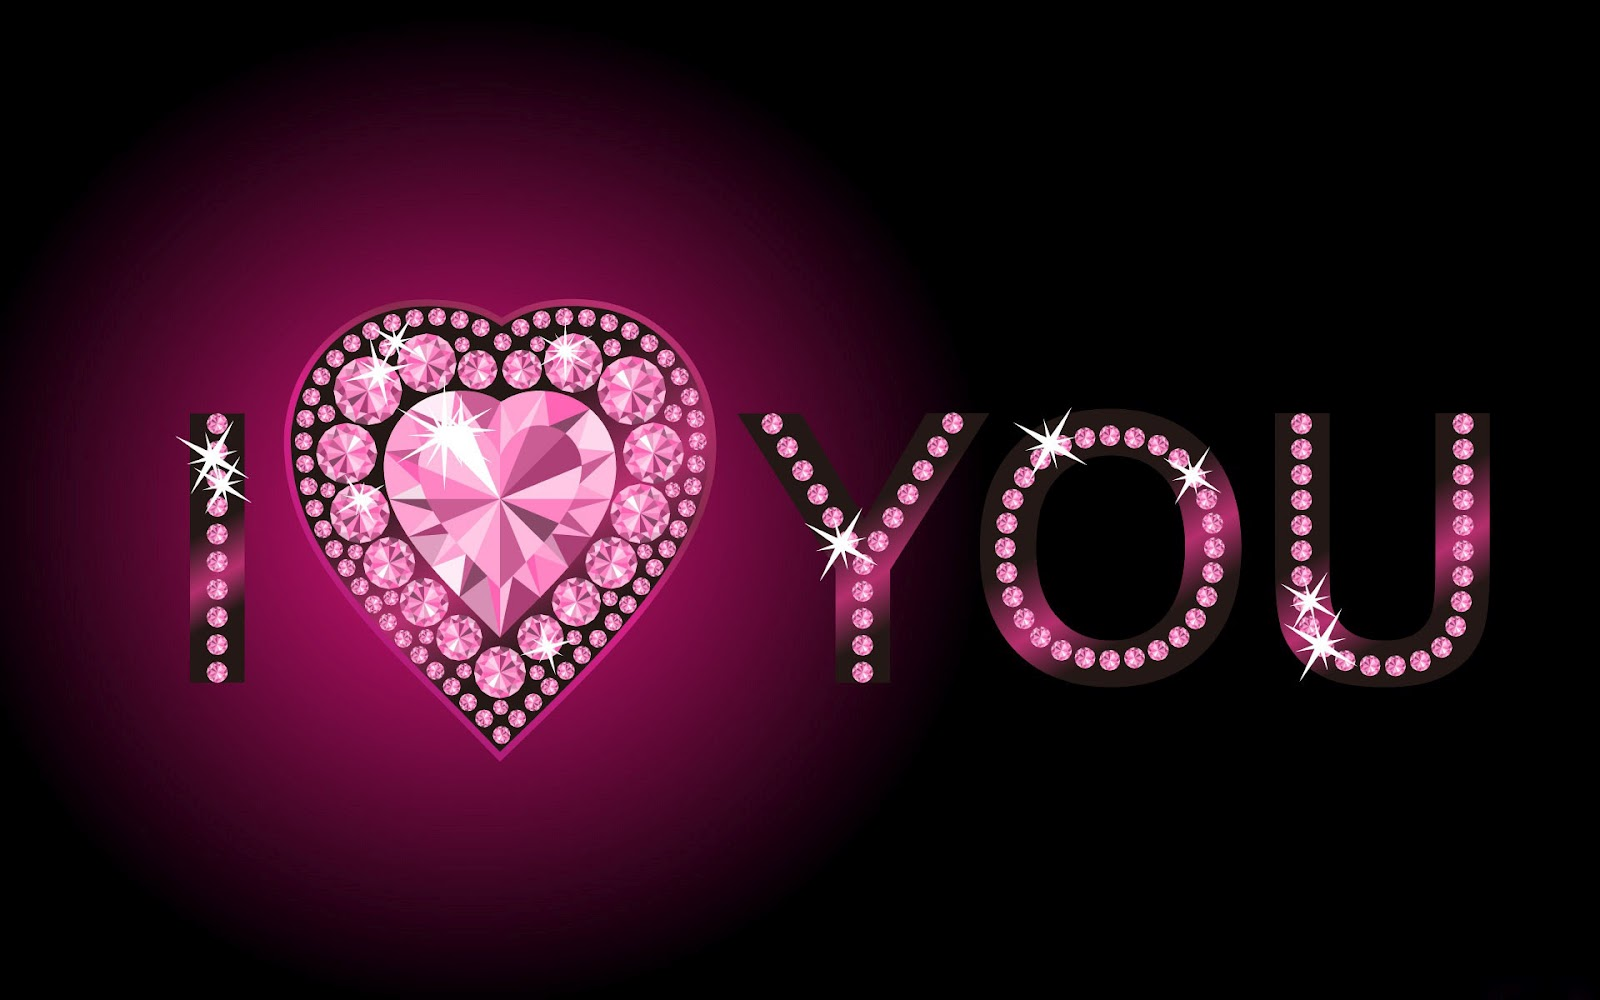 http://1.bp.blogspot.com/-0Xbct6swFsI/TzduXeroxNI/AAAAAAAAF_4/2PbAo4aGytI/s1600/I_Love_You_(Valentine_Day_wallpaper).jpg